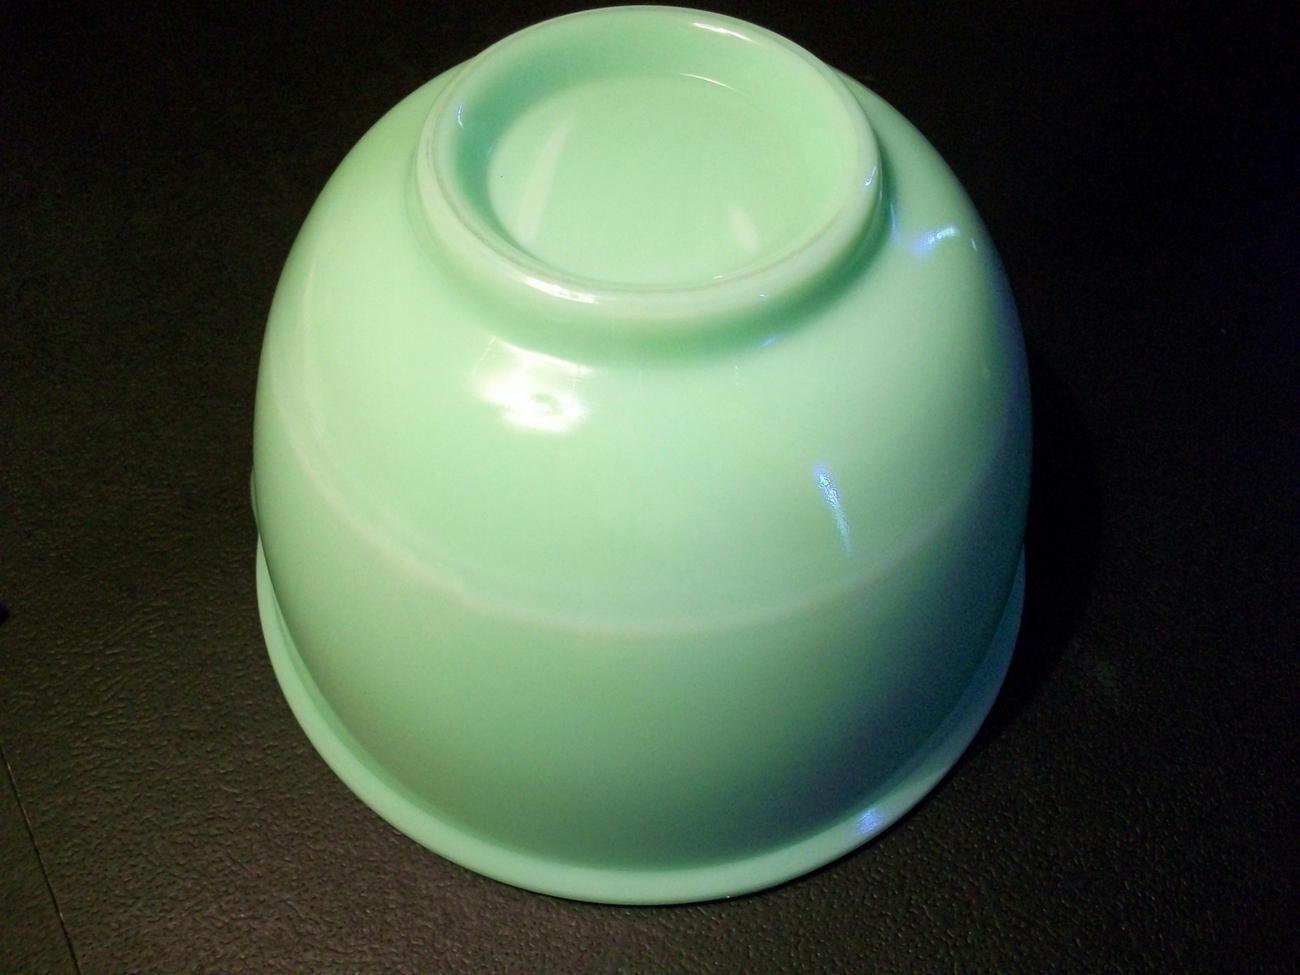 Vintage Jadite Batter Bowl with Spout